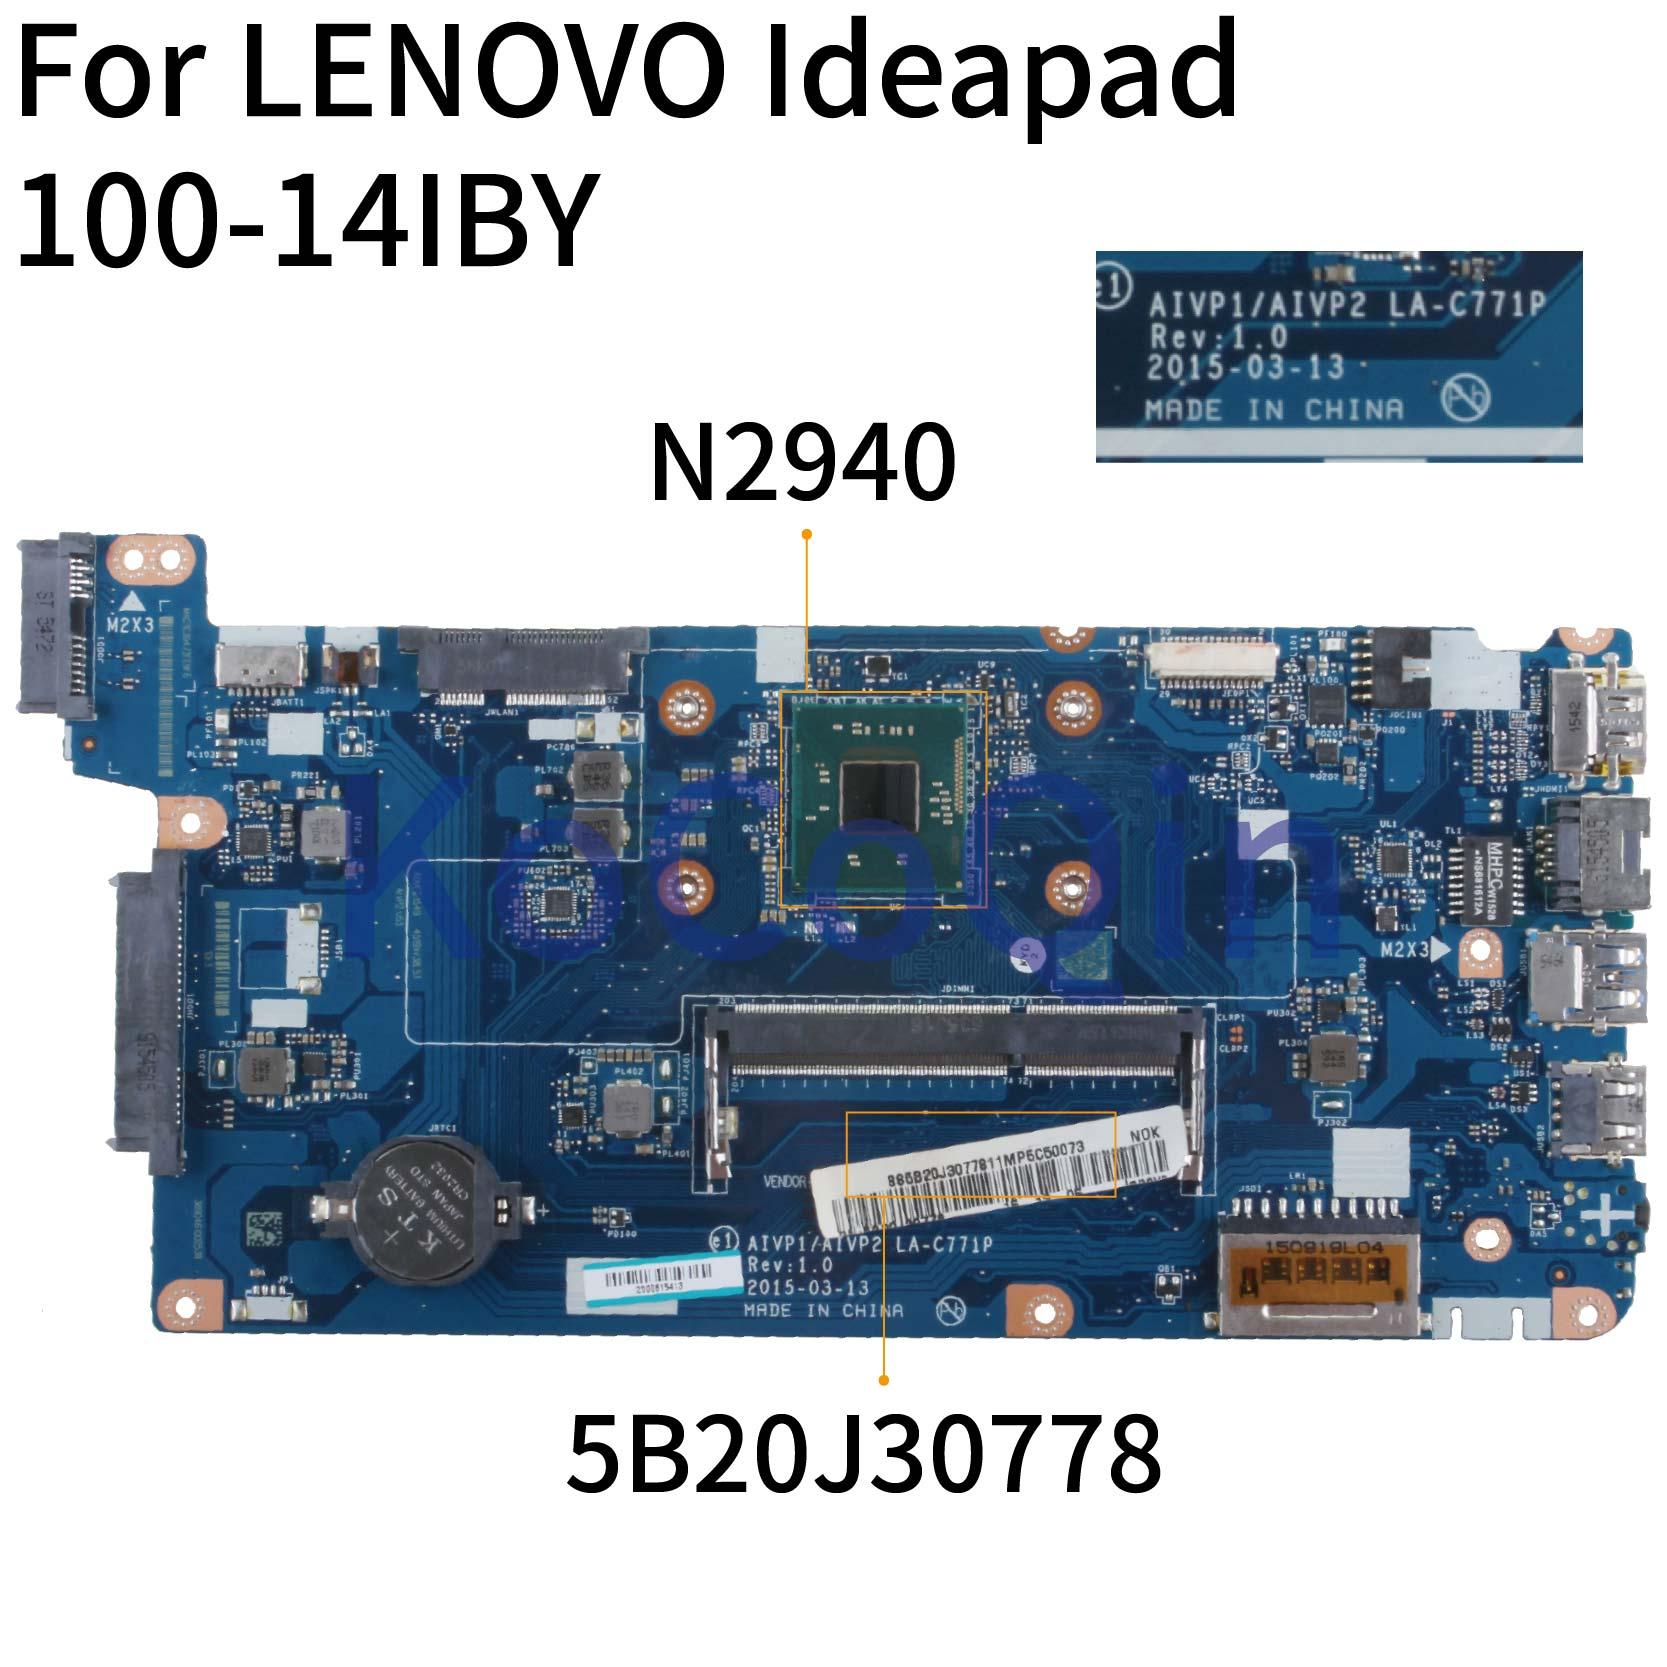 KoCoQin اللوحة الأم لأجهزة الكمبيوتر المحمول لينوفو Ideapad 100-14IBY N2840 N2940 14 بوصة اللوحة الرئيسية AIVP1/AIVP2 LA-C771P